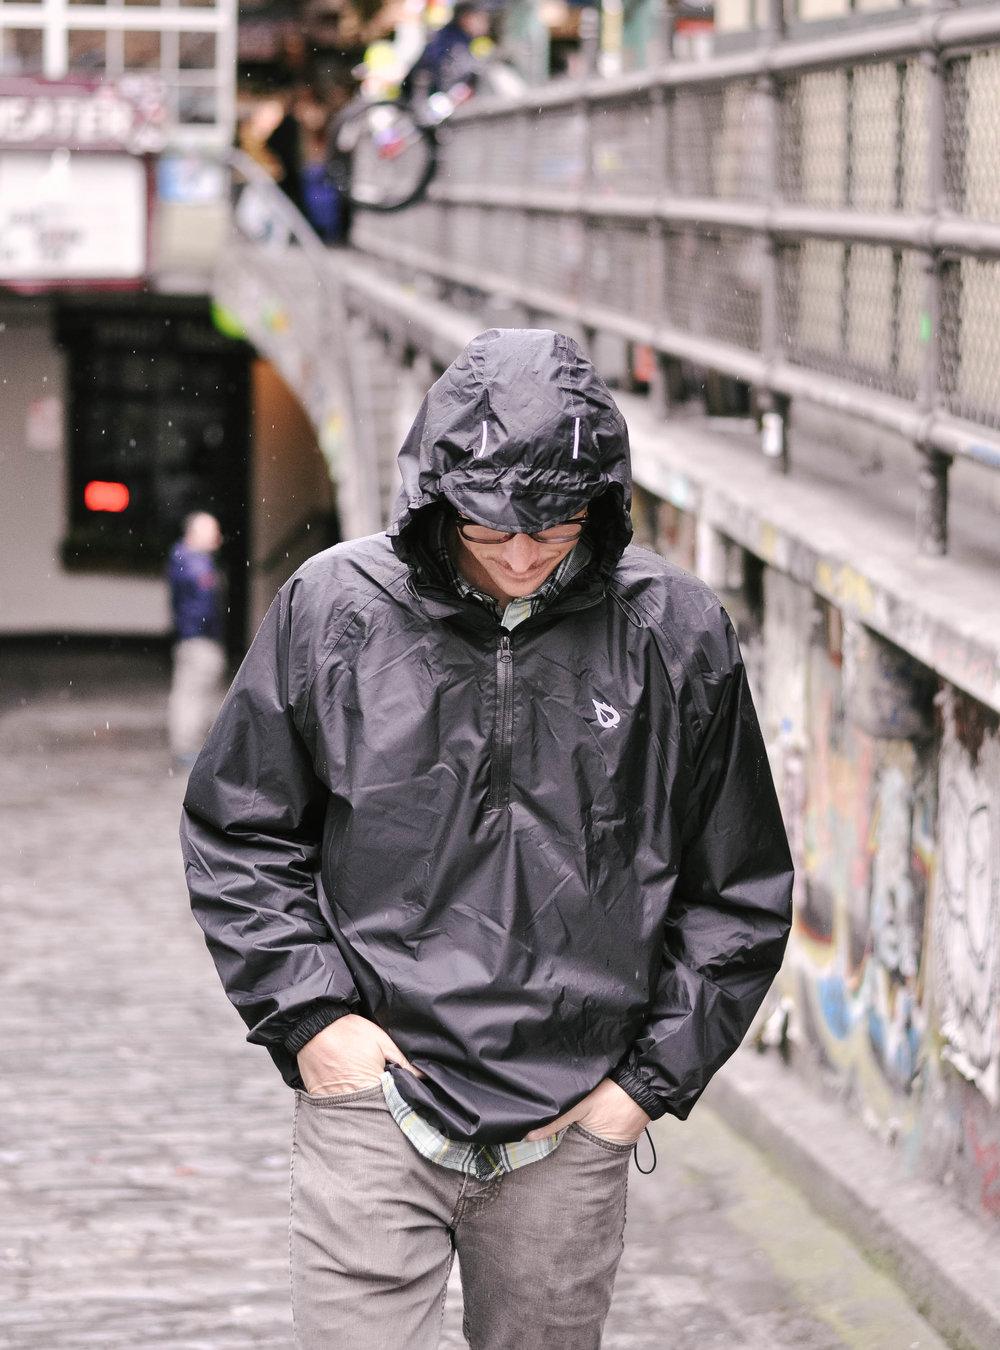 Man wearing raincoat walking in rain